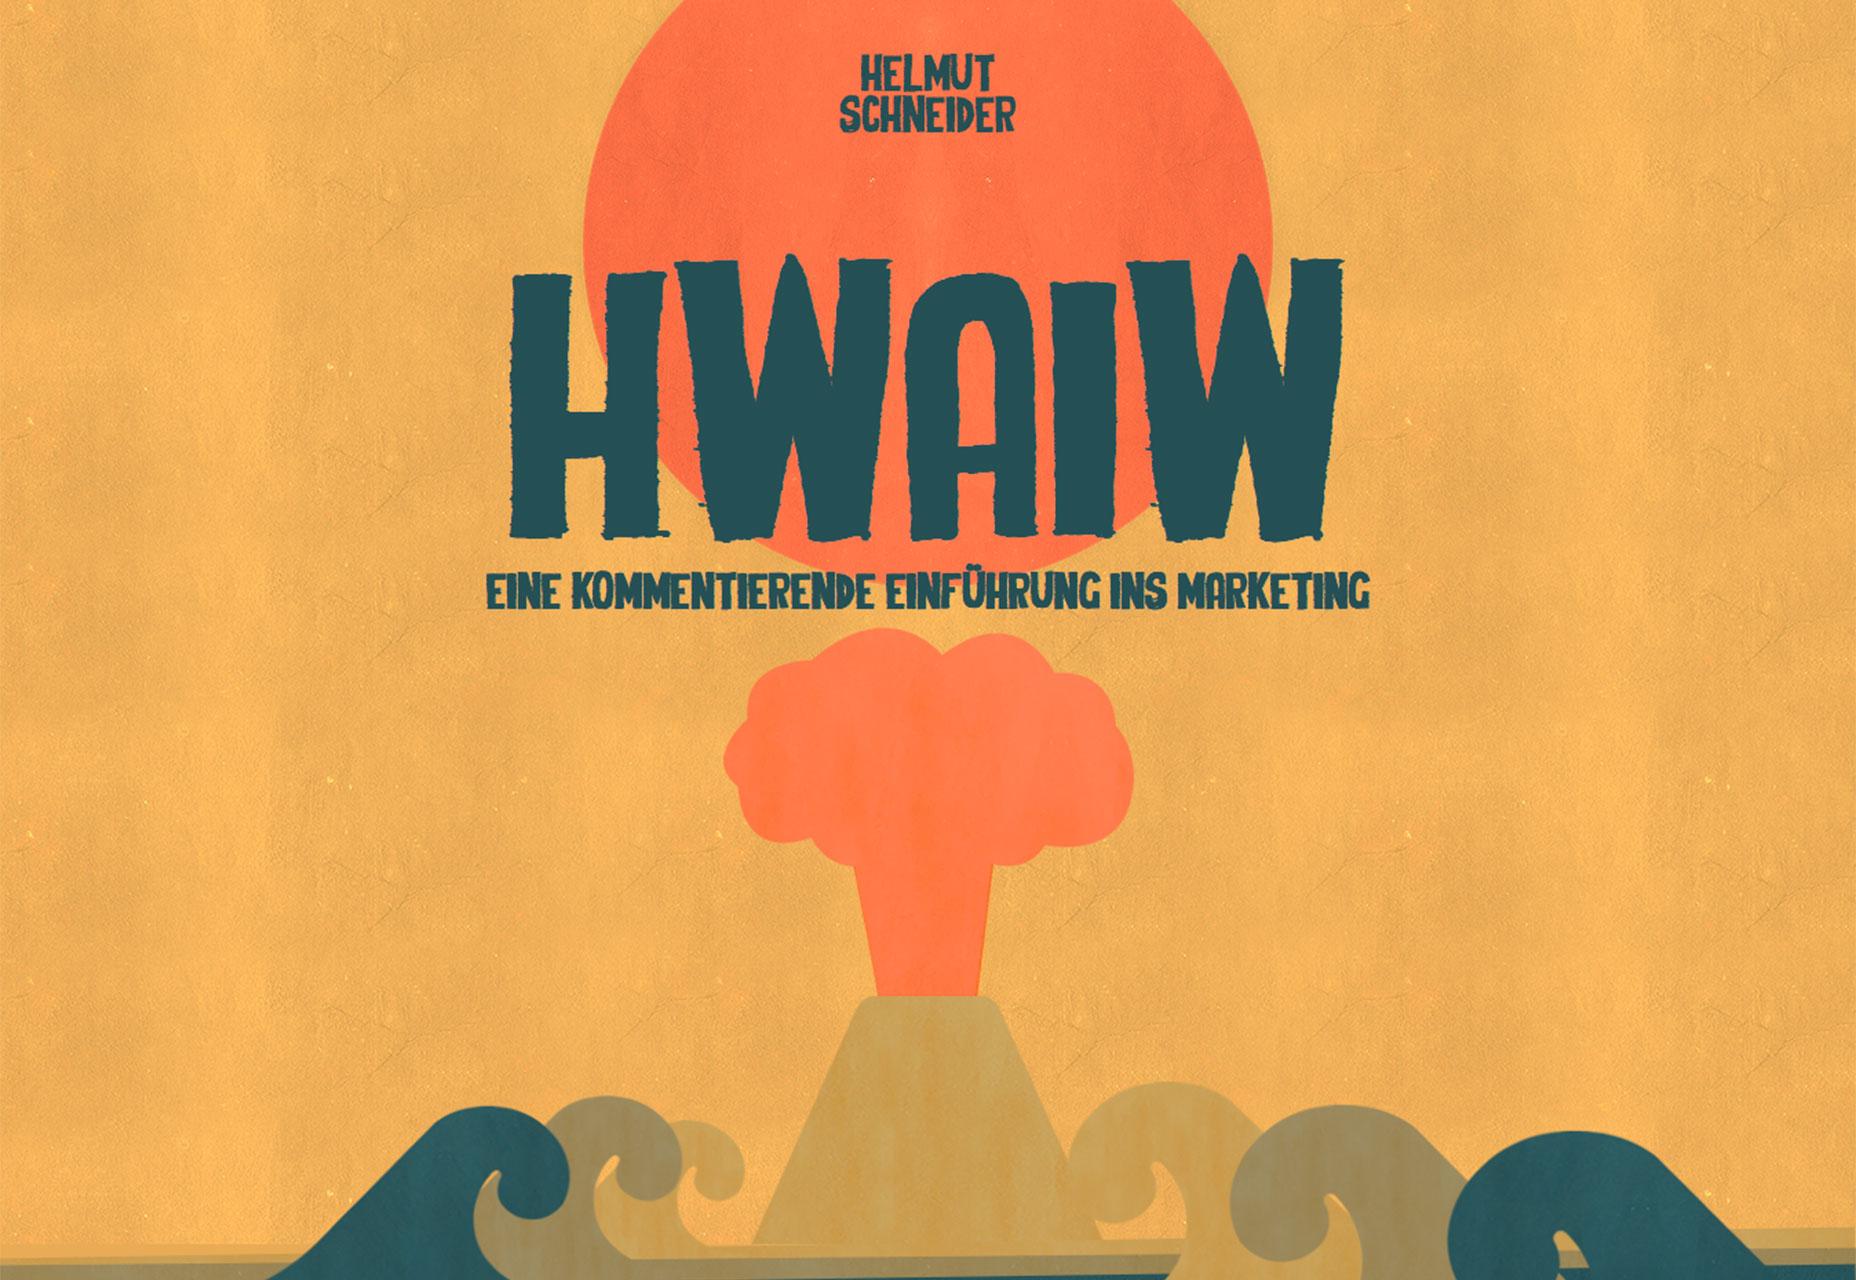 hwawi